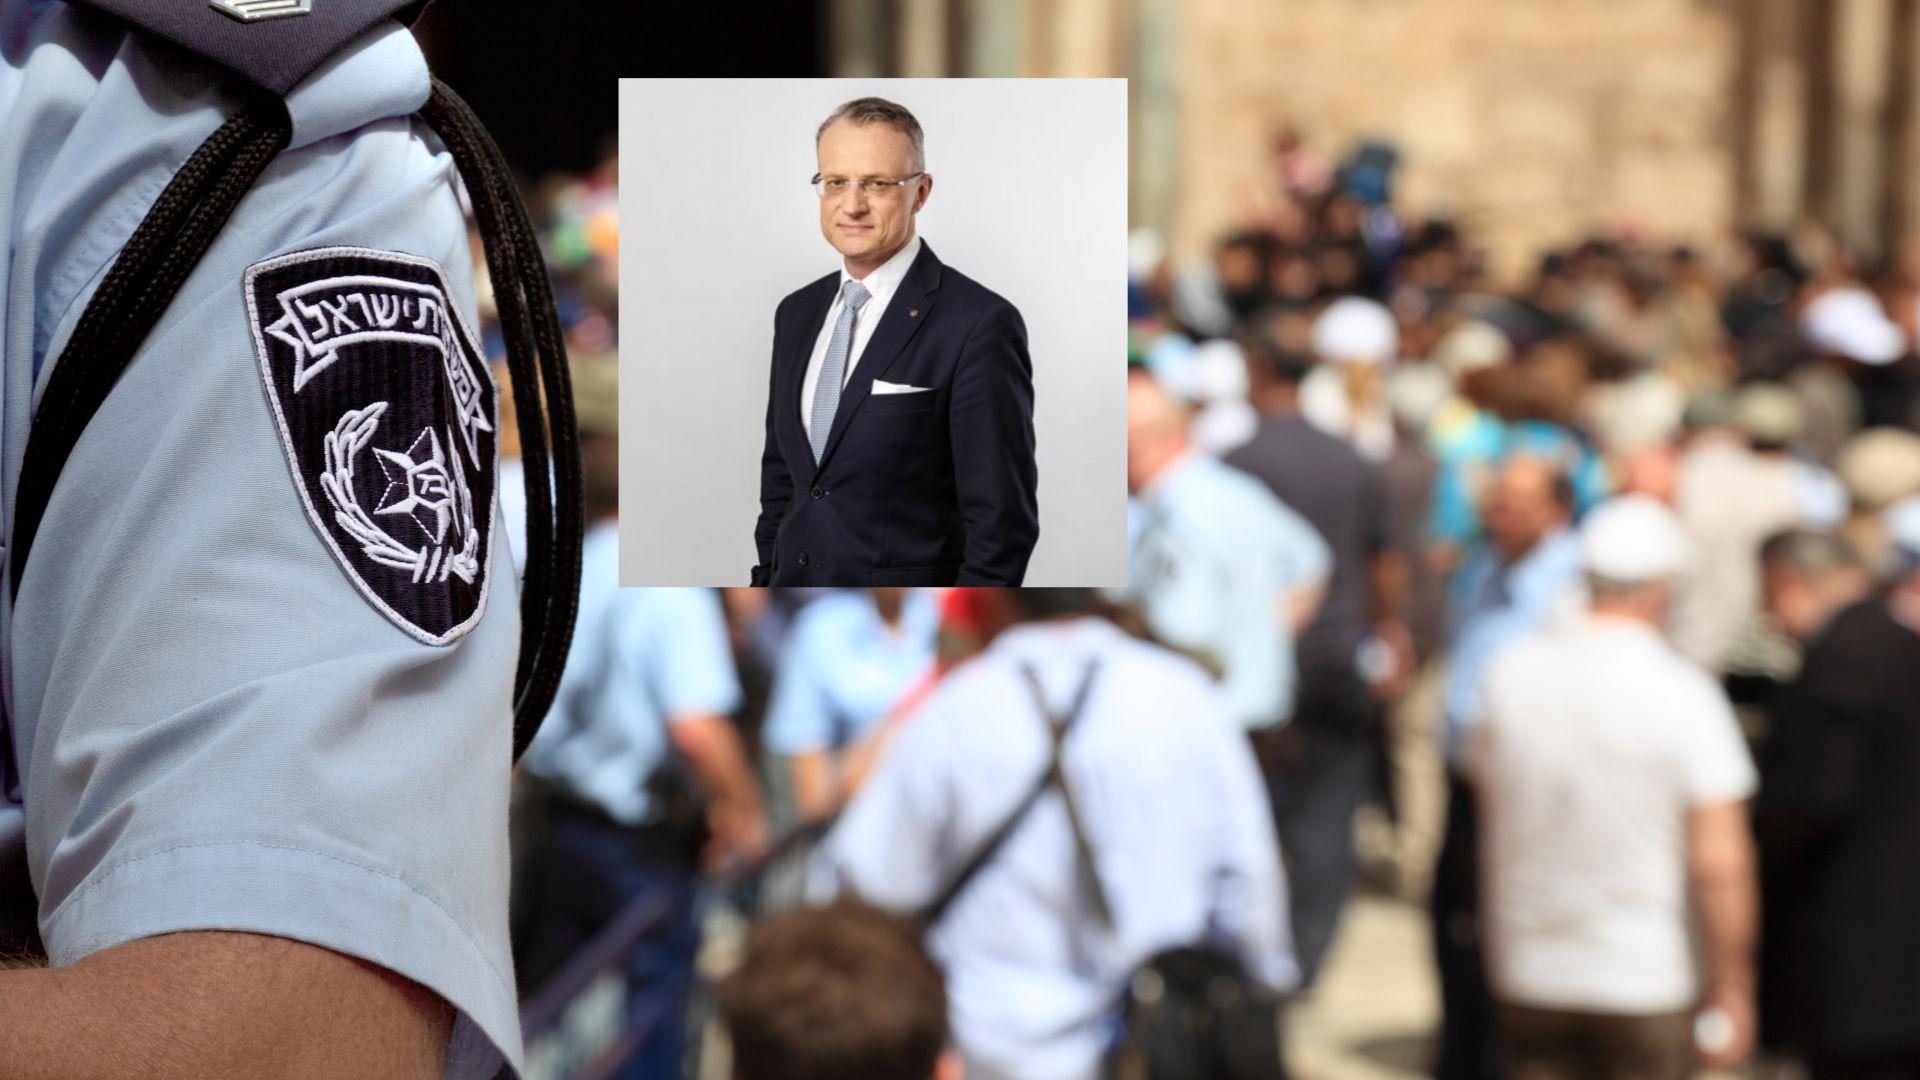 65-годишен израелец наплю полския посланик в Тел Авив